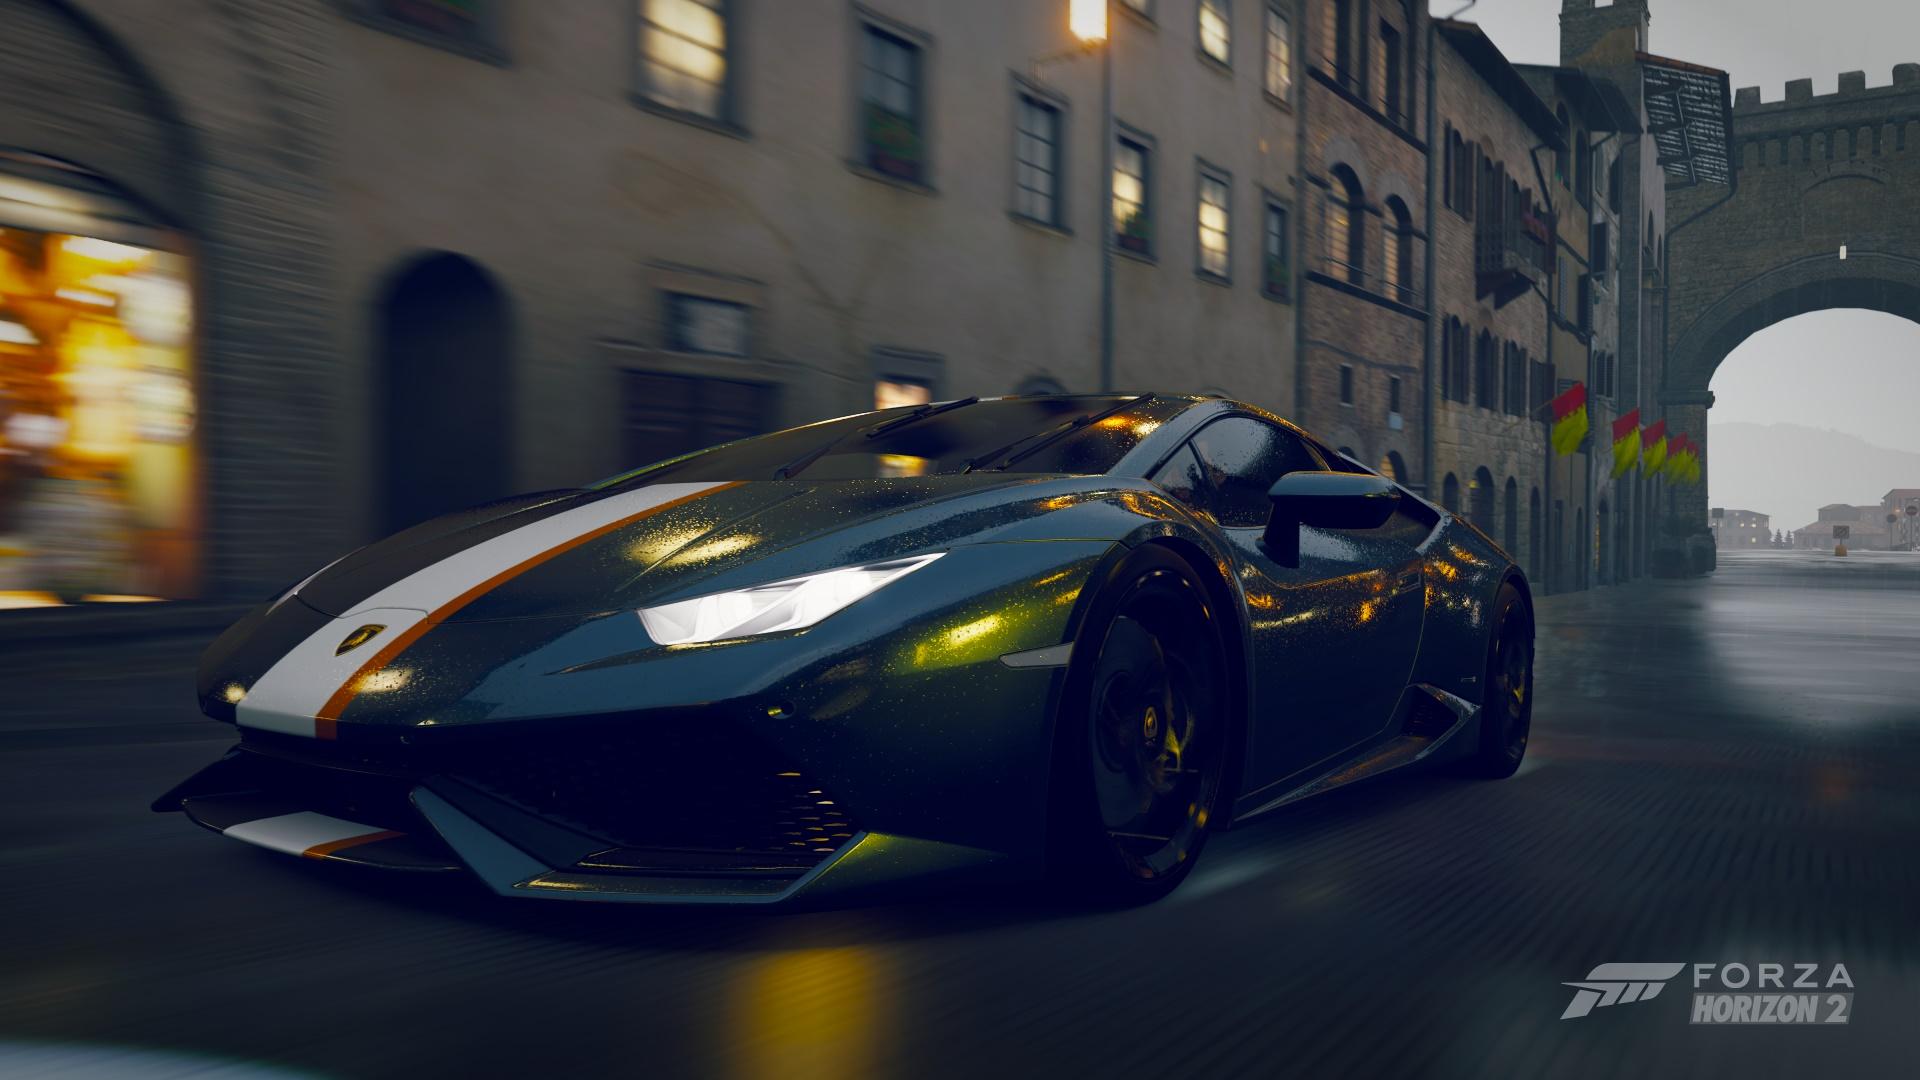 7c22a0139b5ff779893da5c0de6c0256 Elegant Lamborghini Huracan forza Horizon 2 Cars Trend